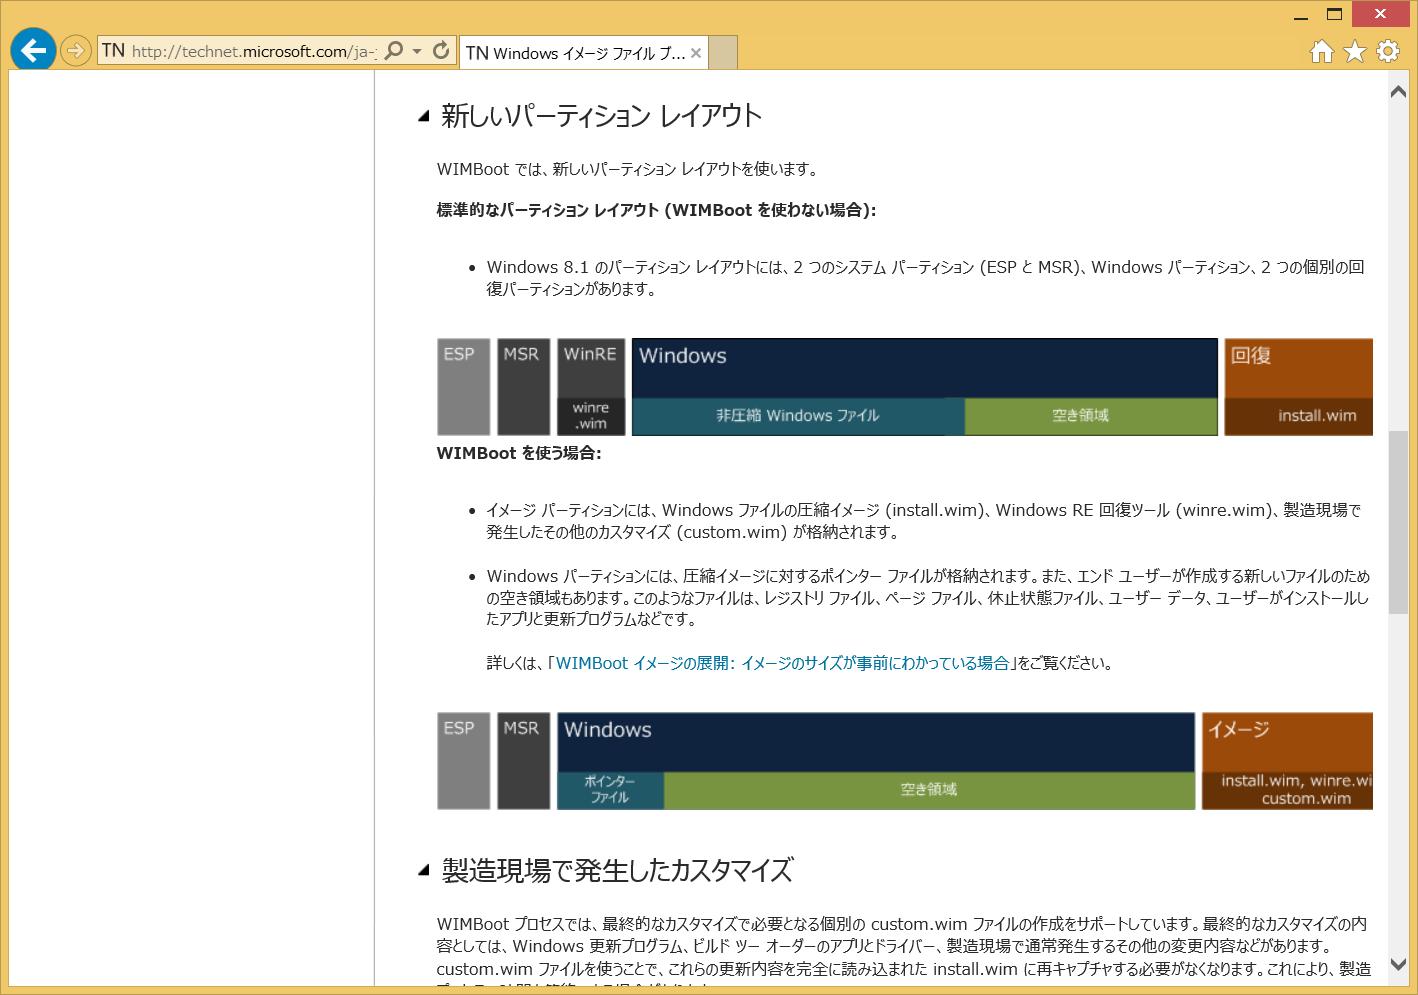 Windows 8.1 Updateの新機能WIMboot。Technetライブラリに詳しい解説が掲載されている